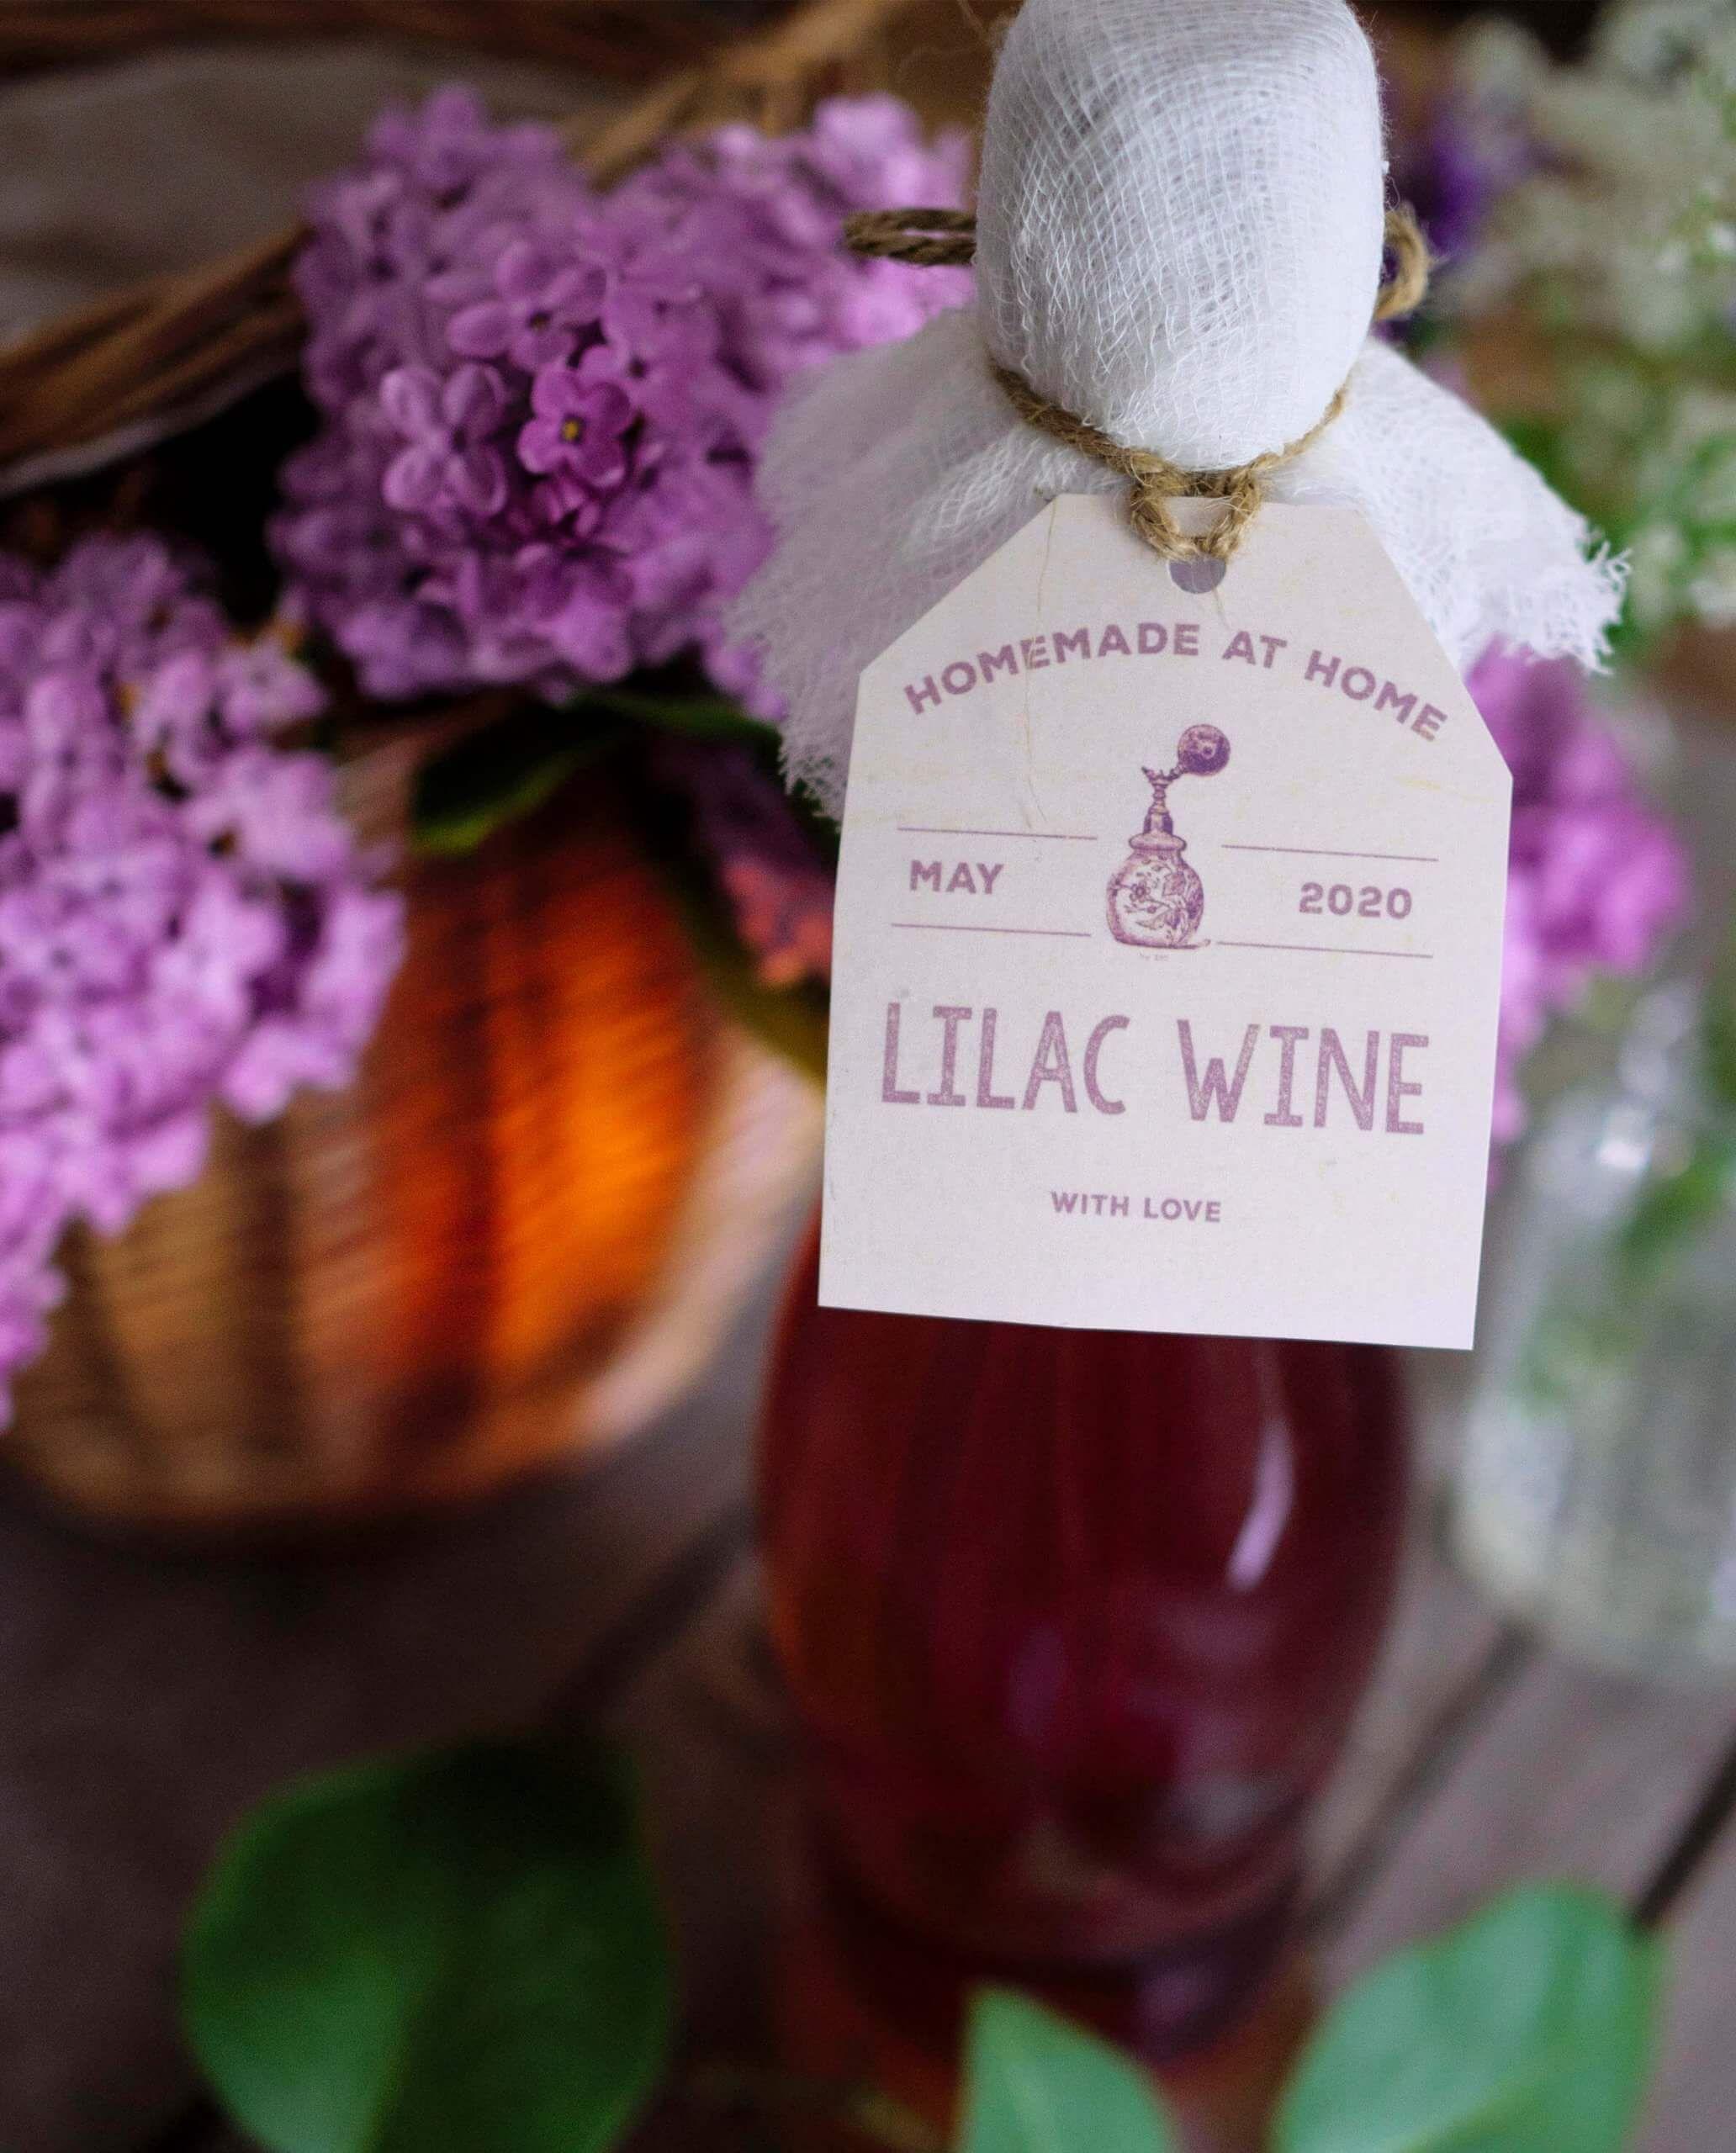 Lilac Wine Recipe In 2020 Wine Ingredients Homemade Wine Orange Wine